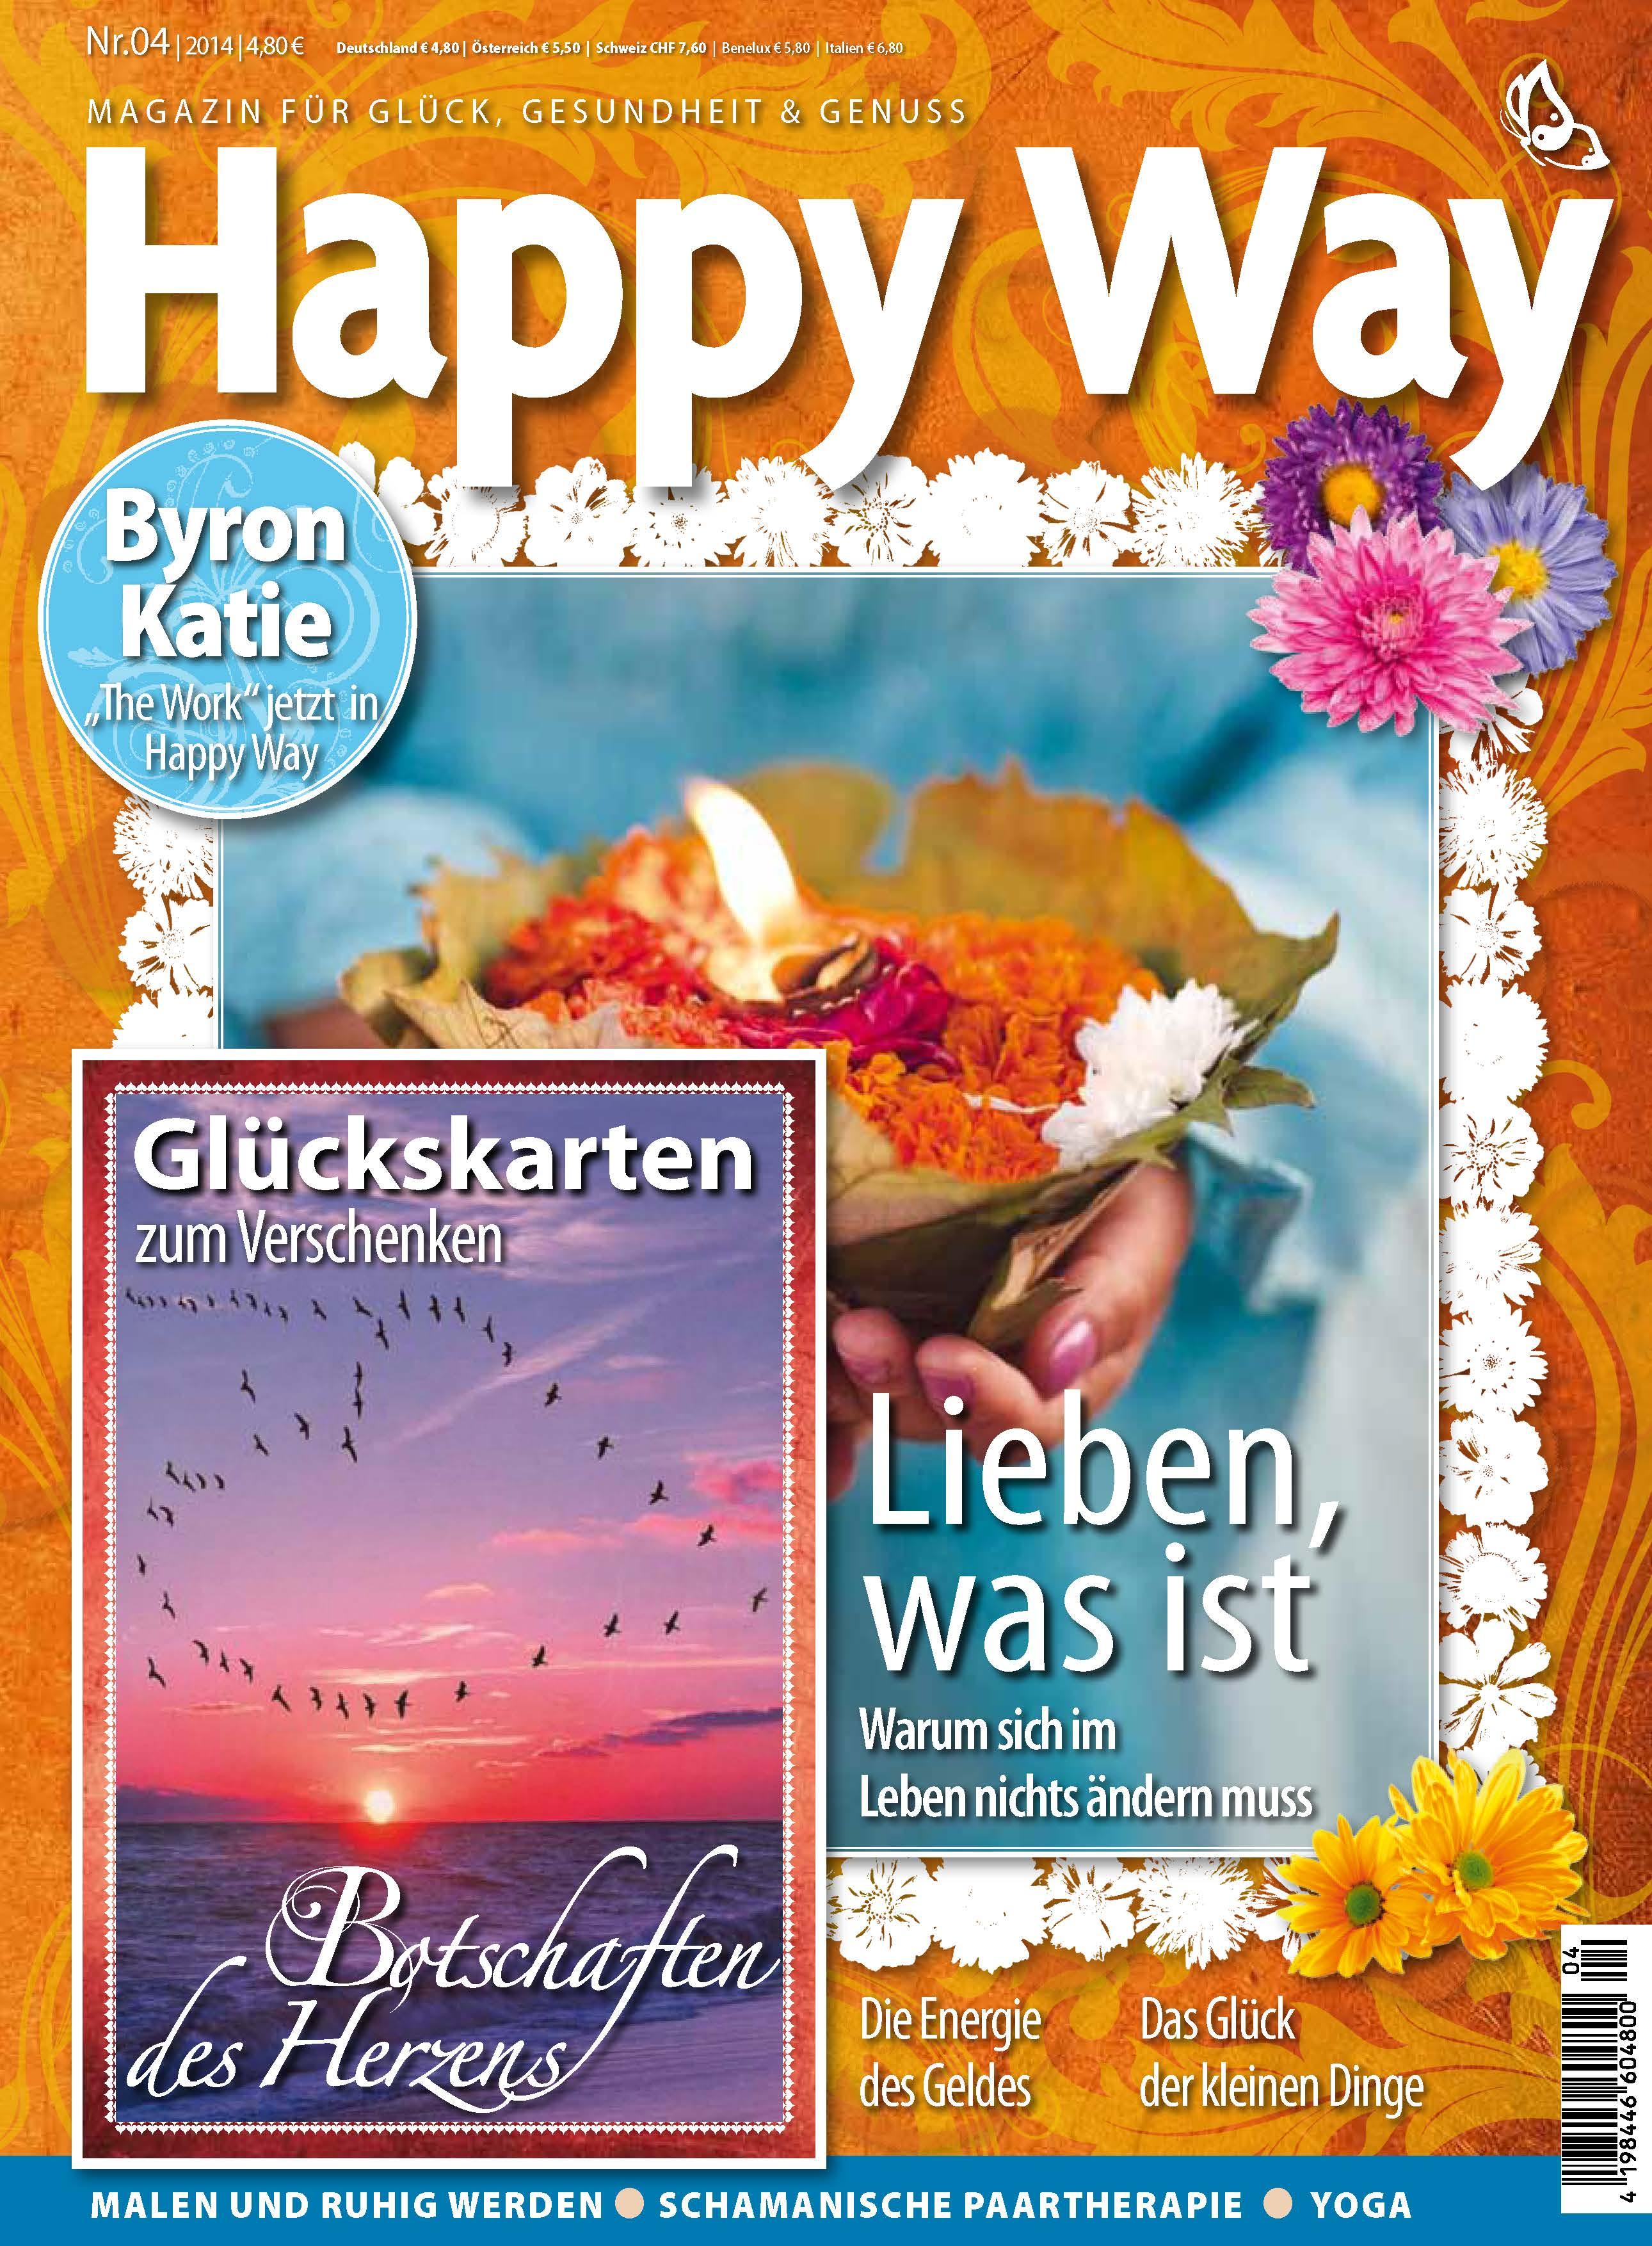 HappyWay-September-2014-Baeume_booklet